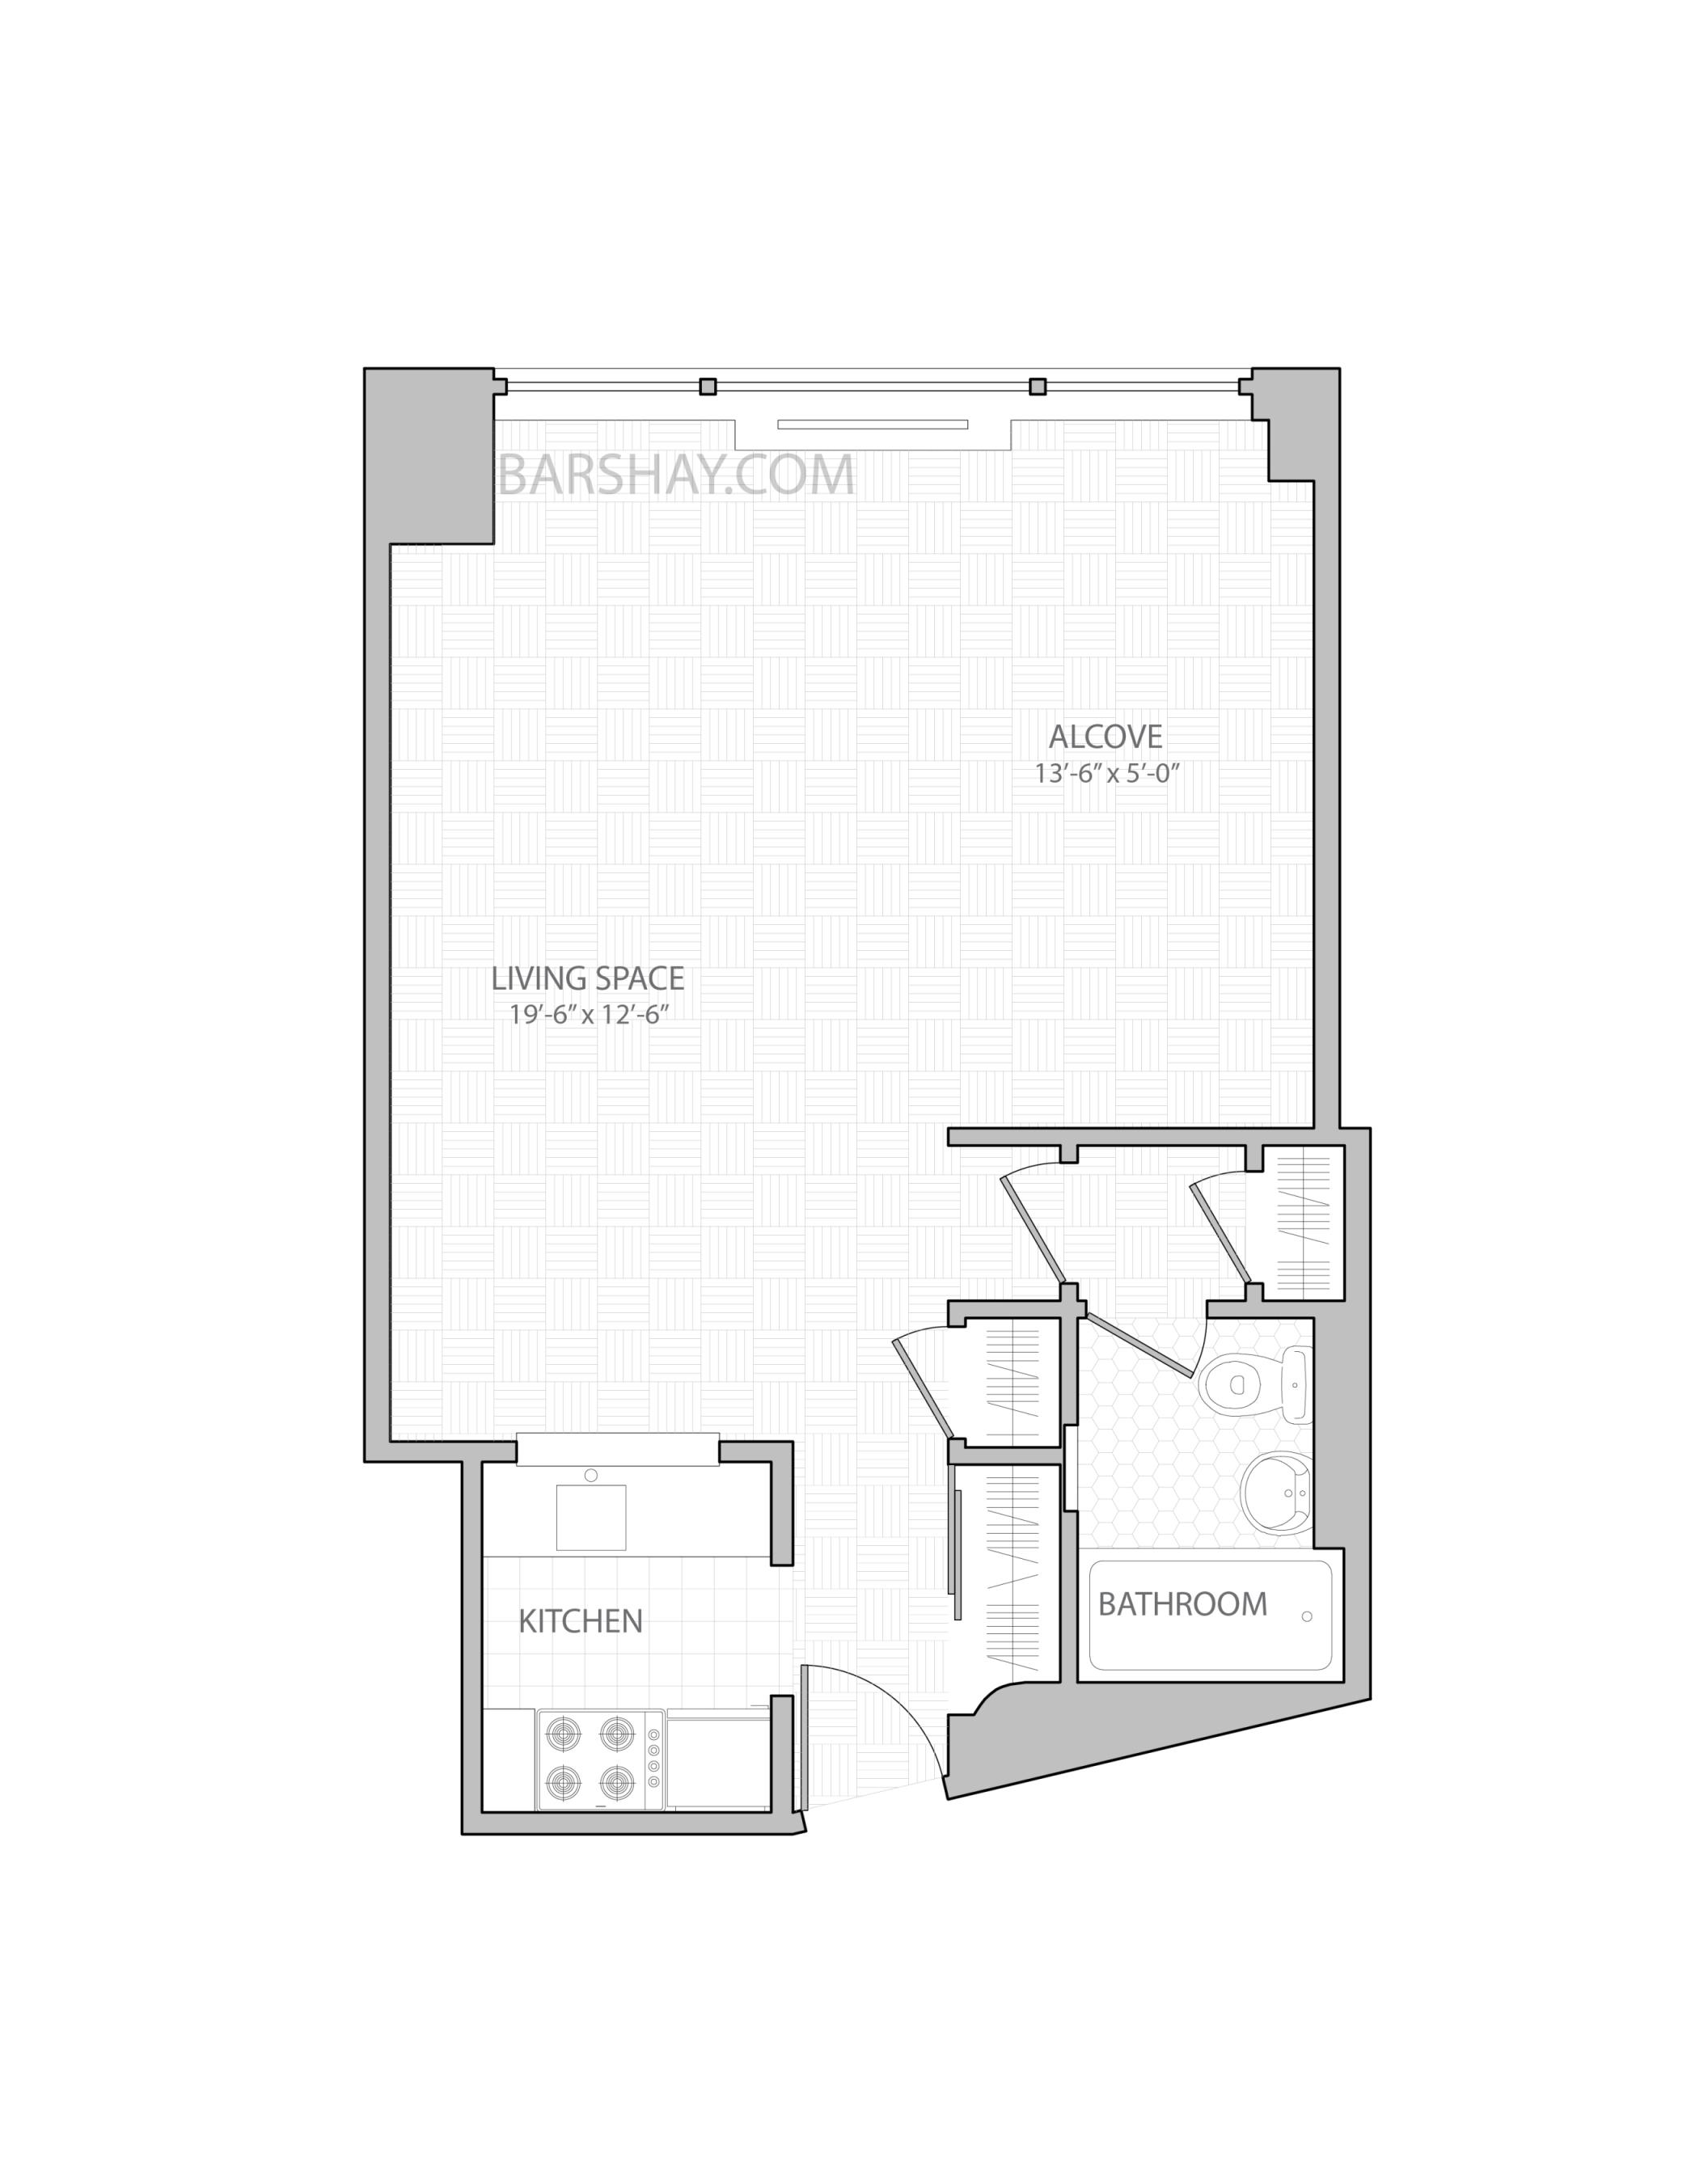 /Users/brettbarshay/Documents/33 Greenwich/7L/7L Plan.dwg